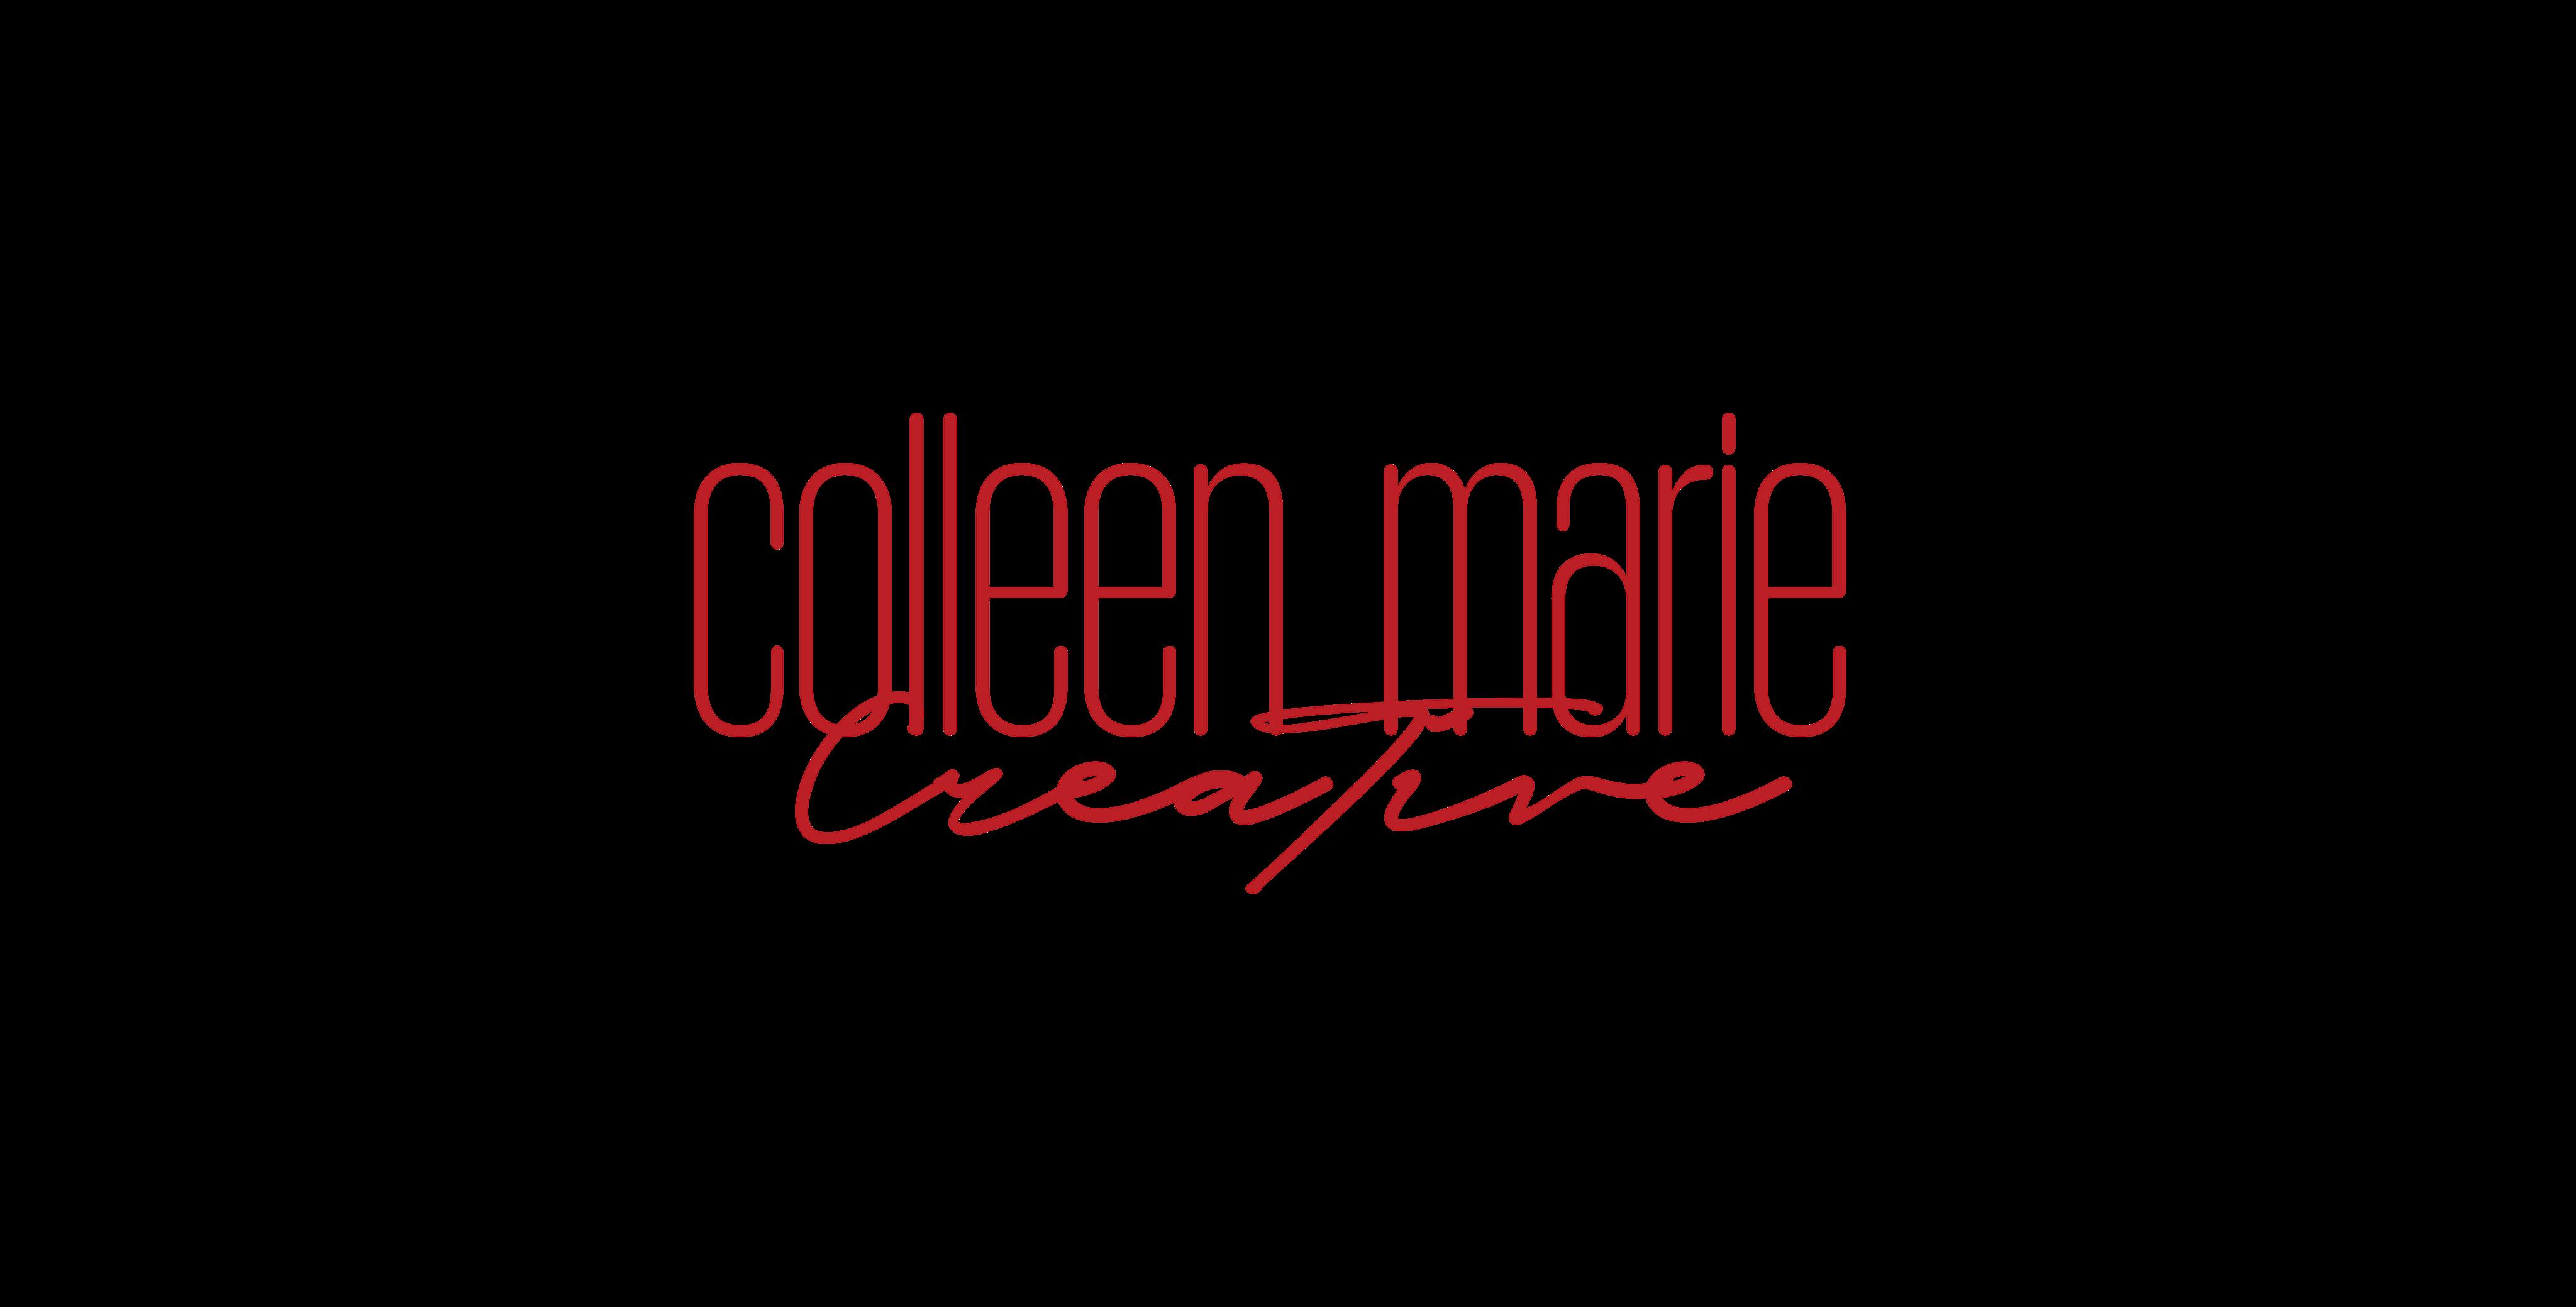 Colleen Reynolds